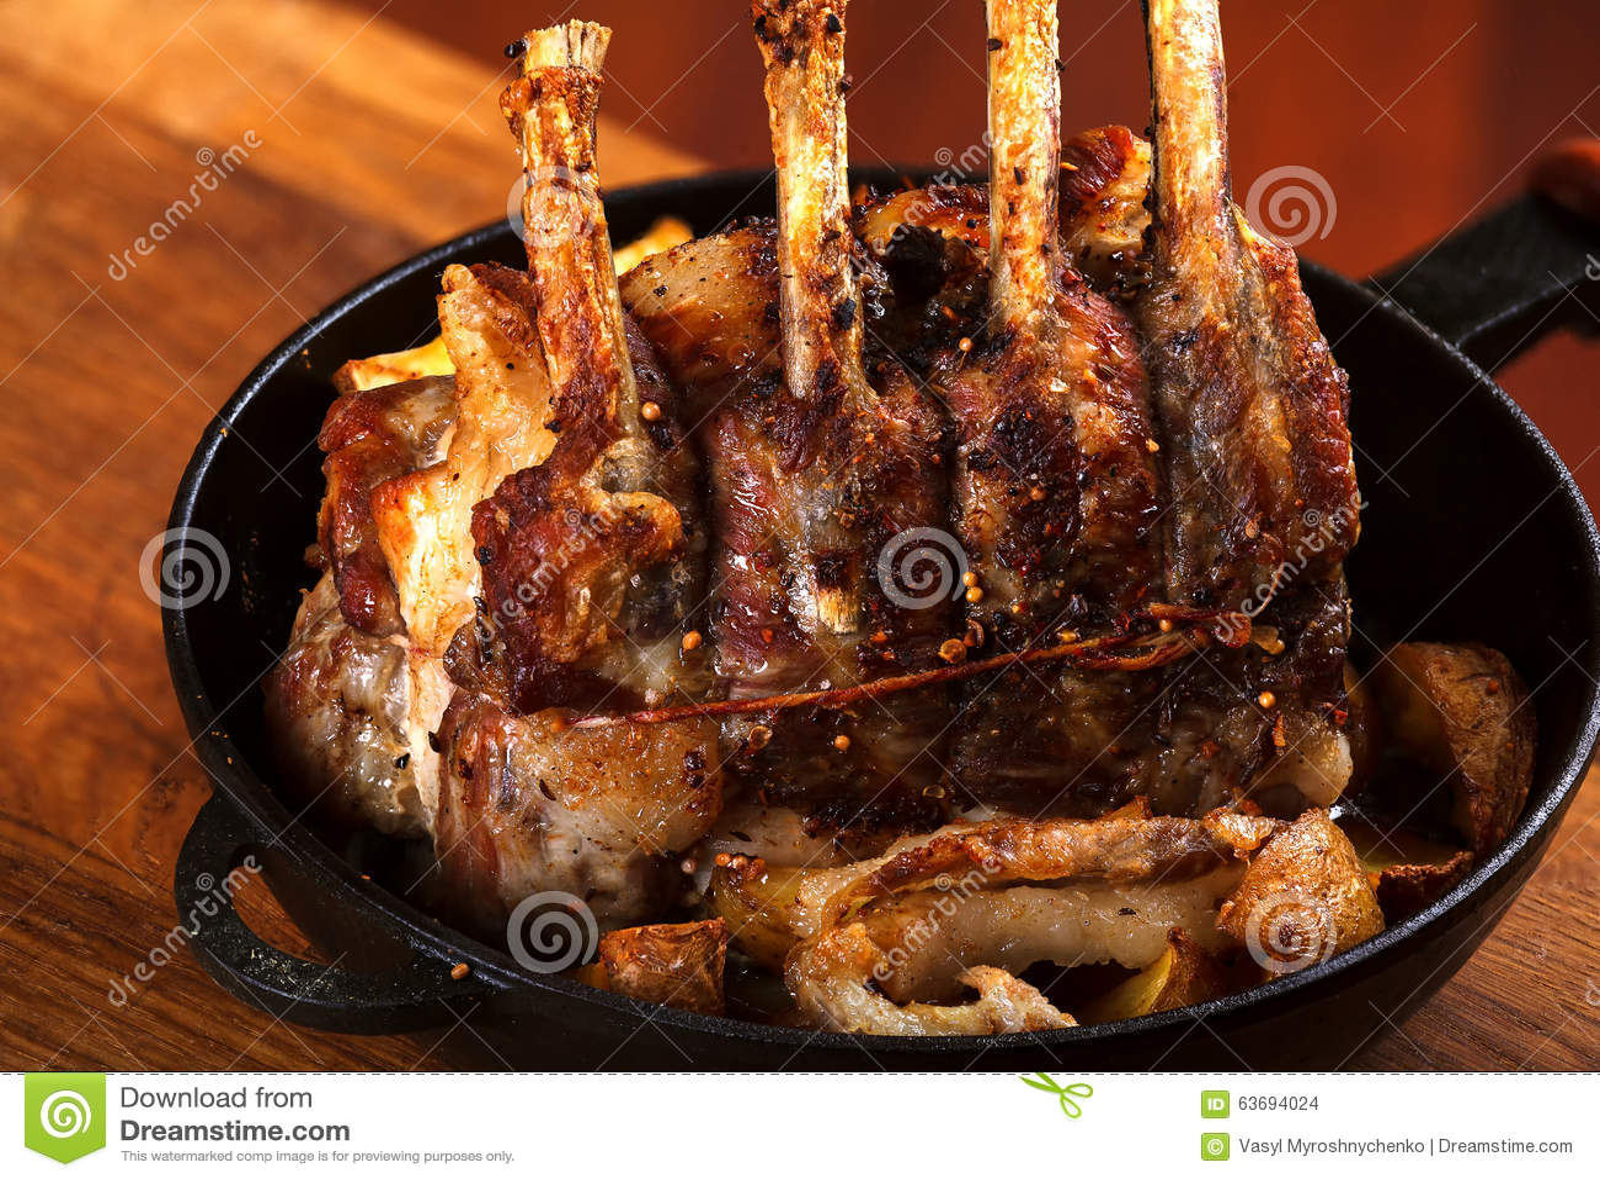 Pork Rib Roast with Oven